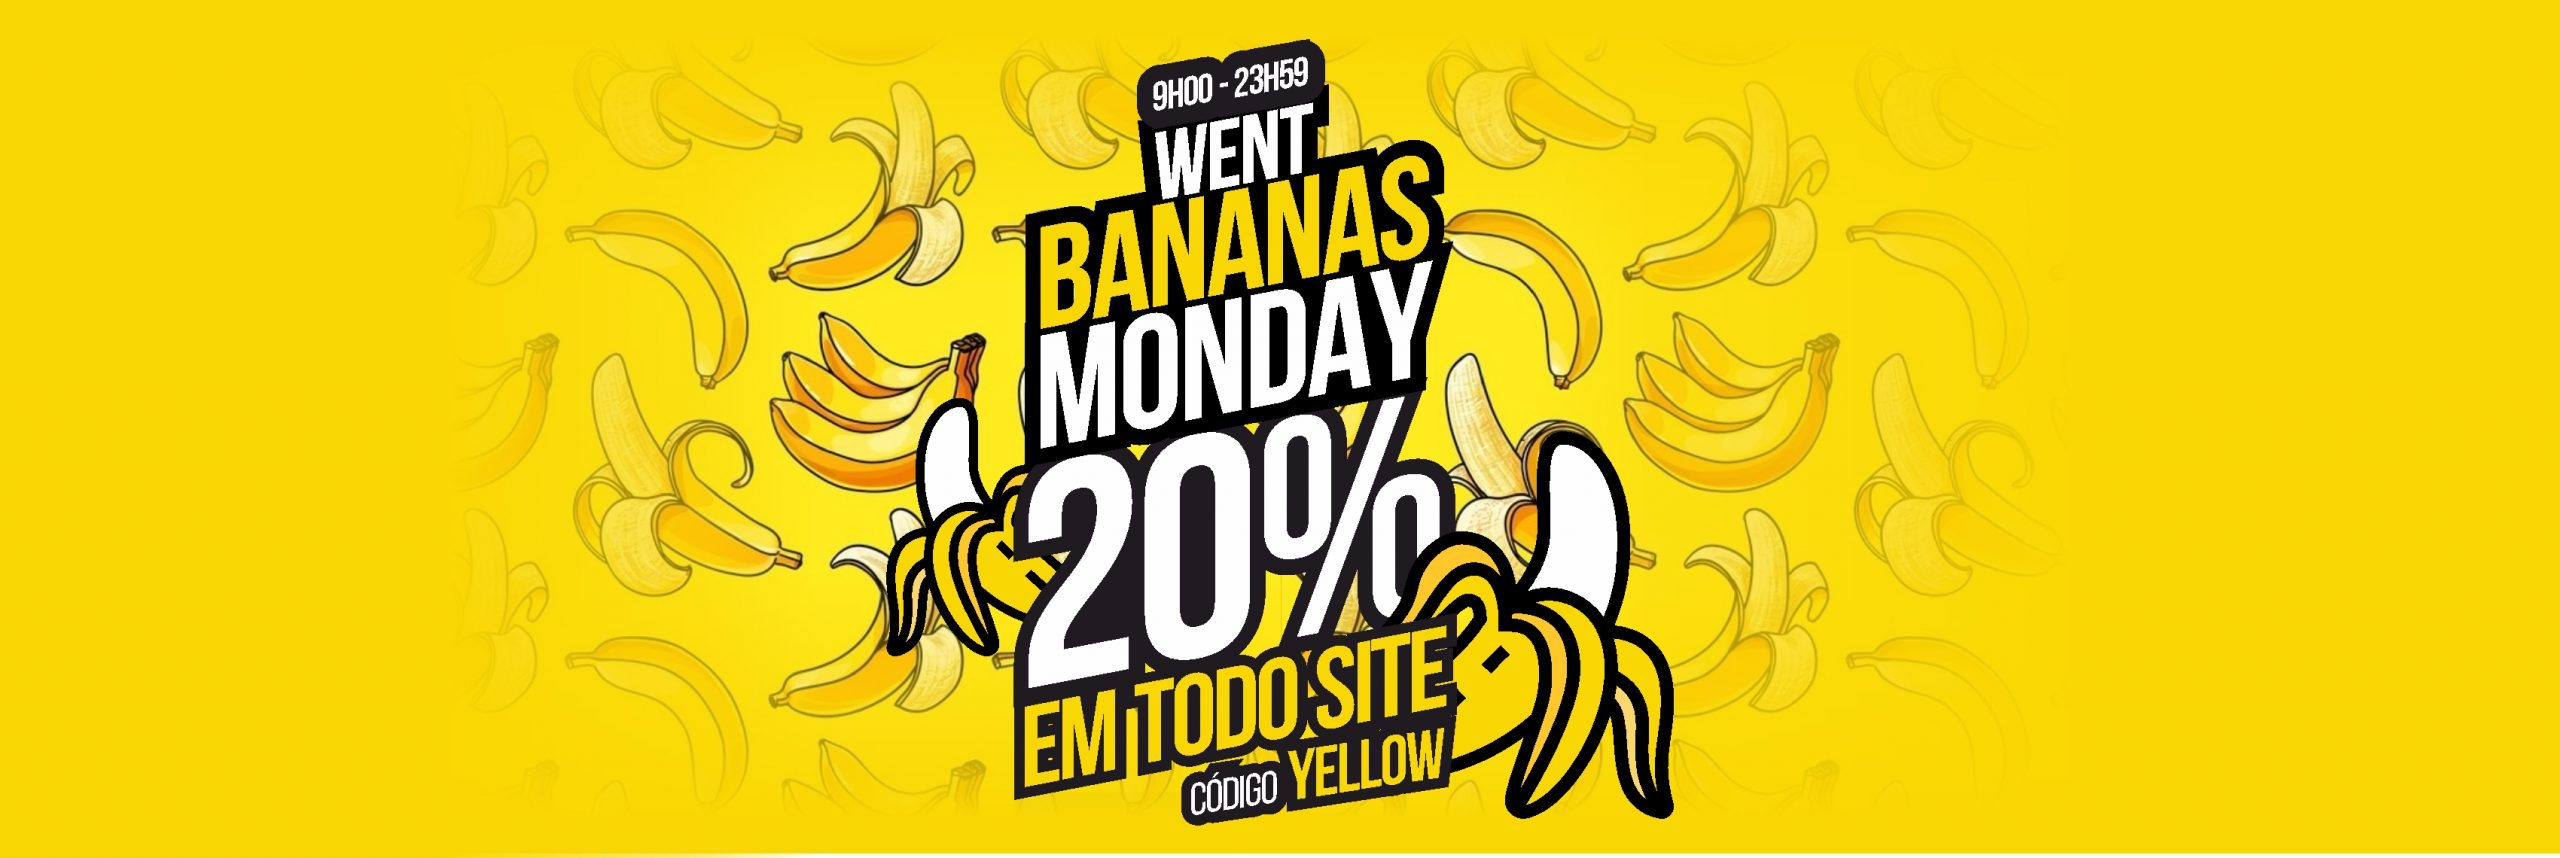 banana-banner-pt